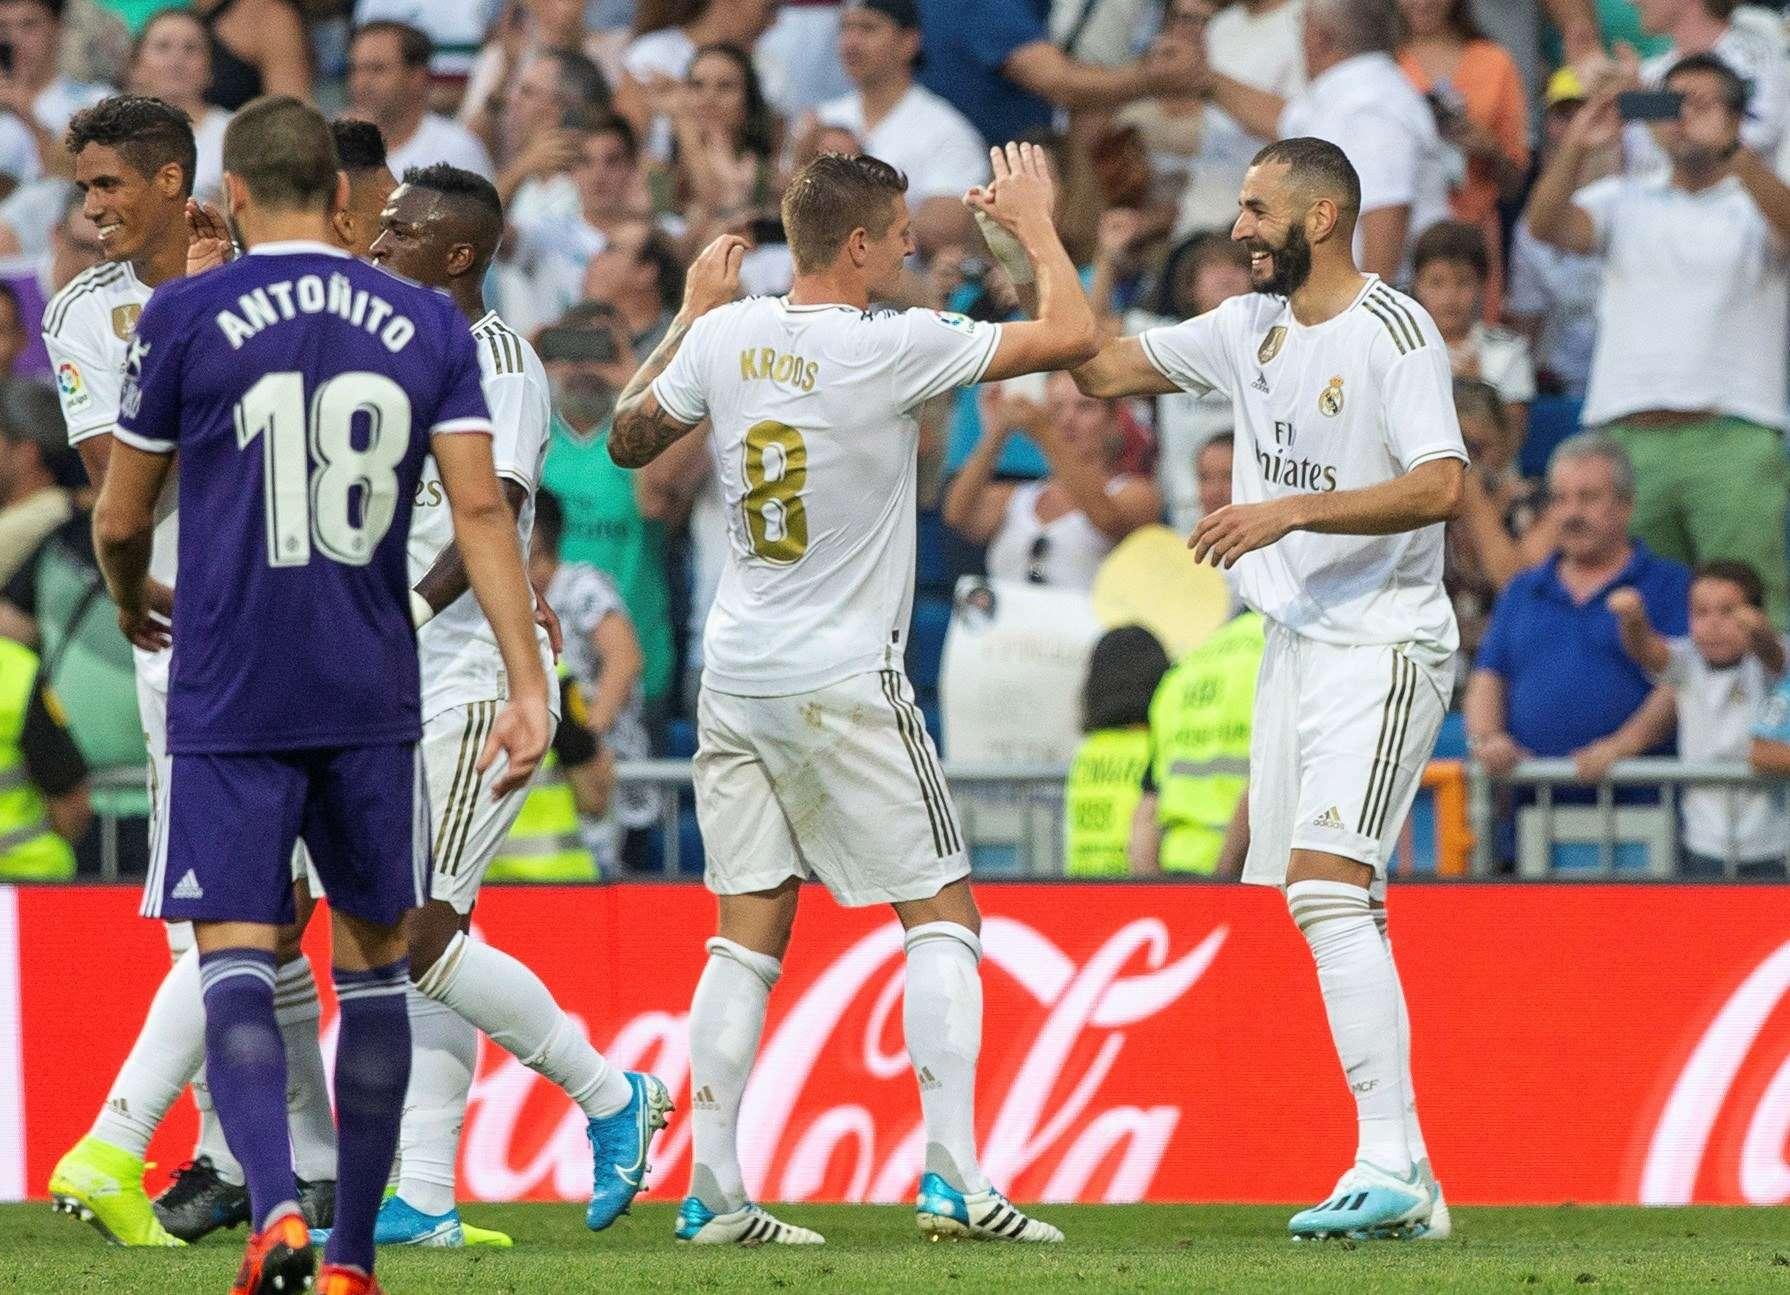 l jugador francés del Real Madrid Karim Benzema (d) y Toni Kroos (i), celebran el gol de Benzema ante el Real Valladolid. Foto: EFE